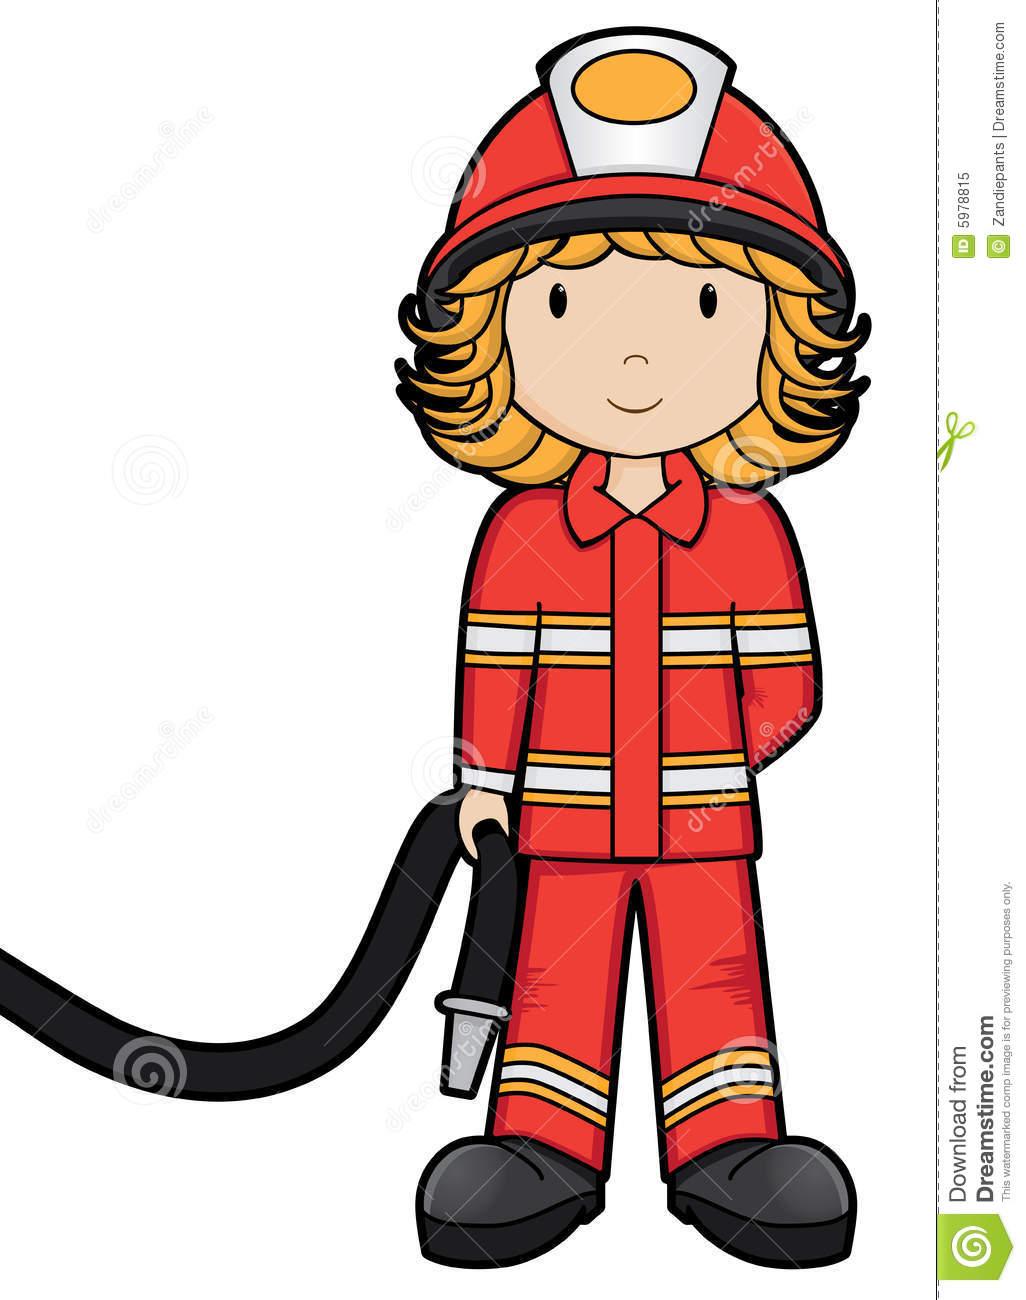 Fireman Clipart u0026amp; Fireman Clip Art Images - ClipartALL clipartall.com